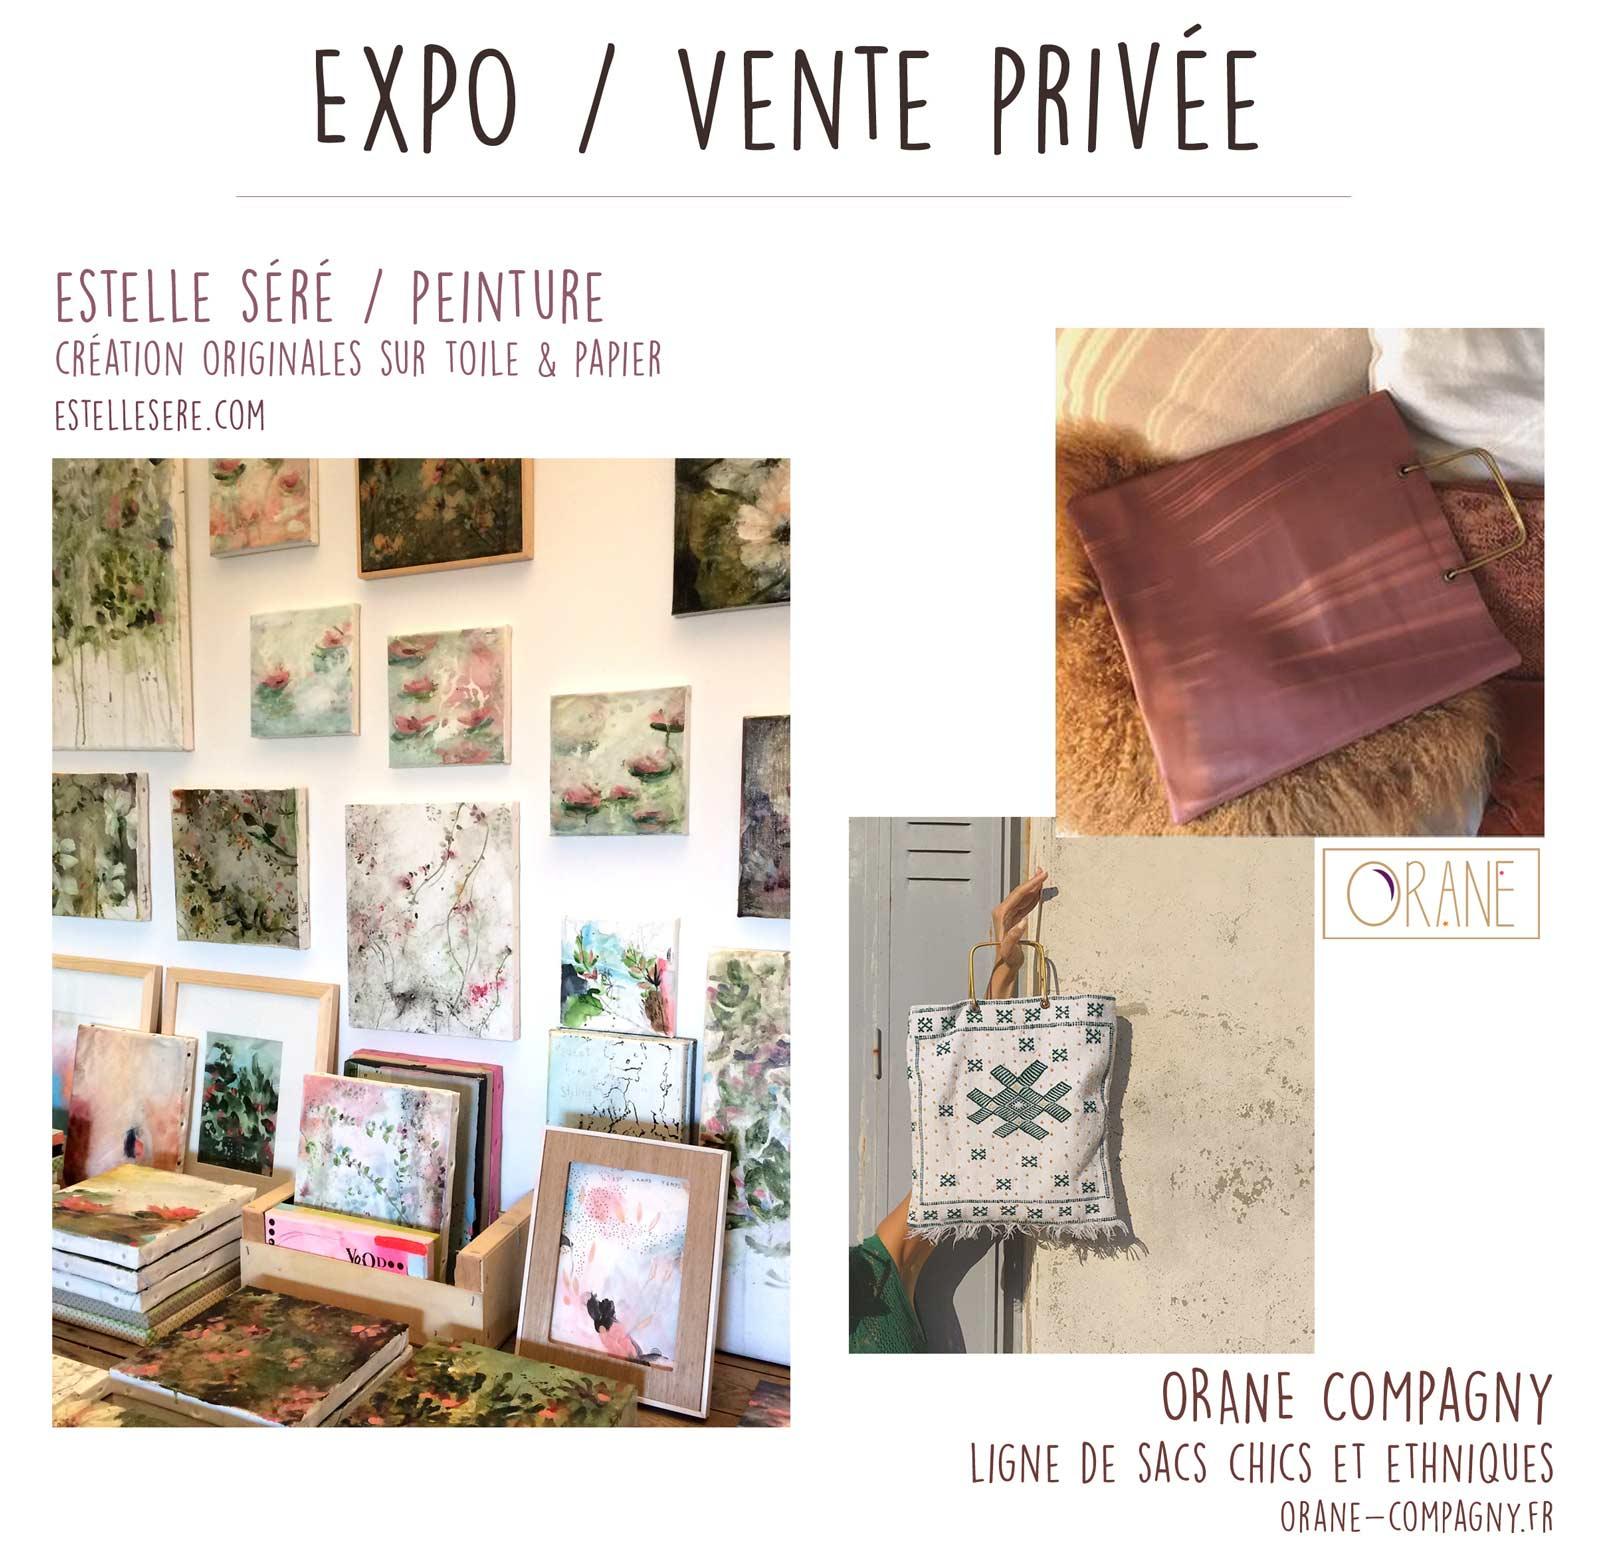 You are currently viewing Expo Vente privée – Estelle séré & Orane Company